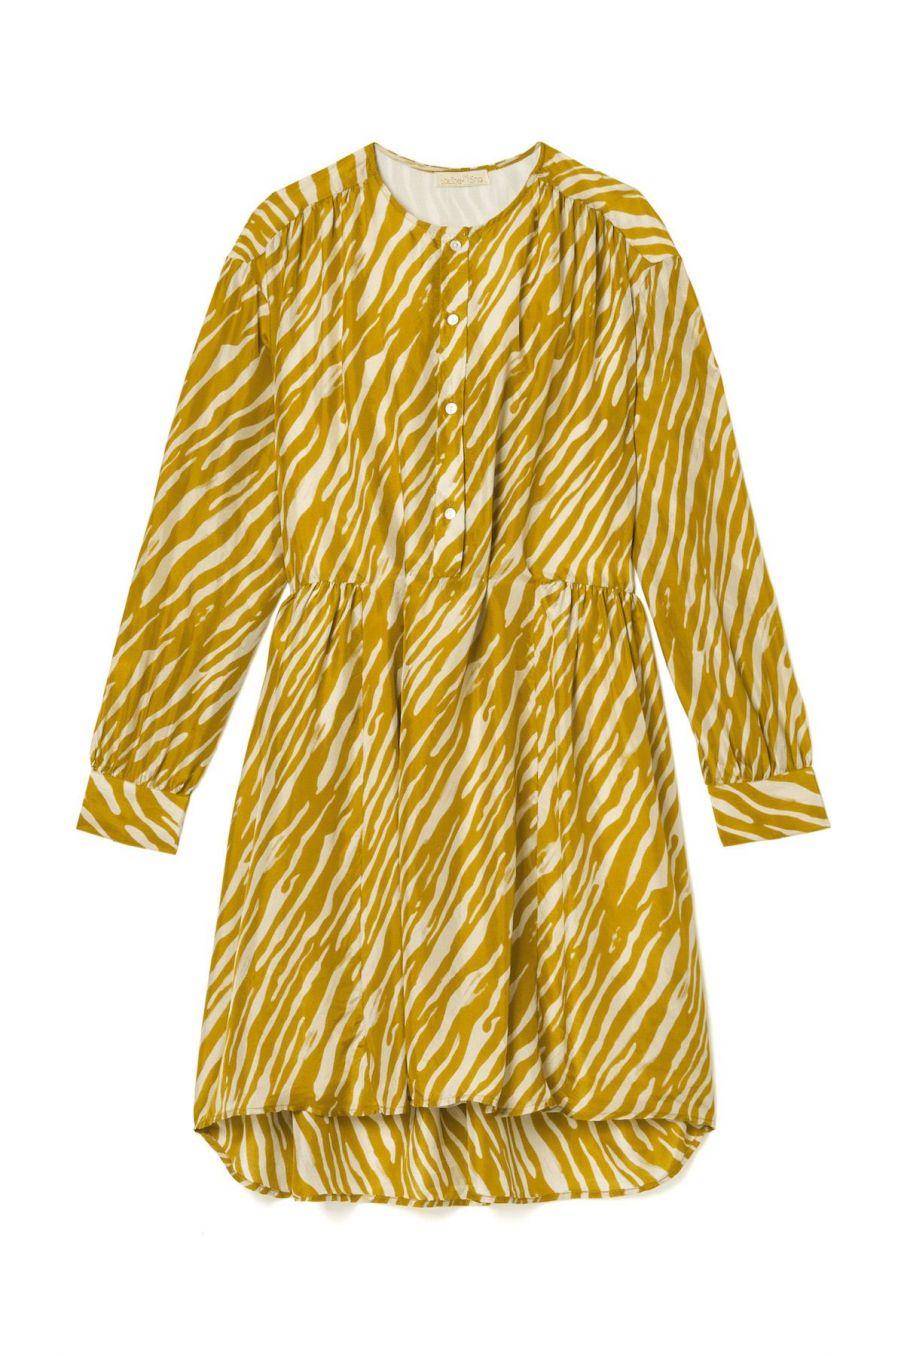 boheme chic vintage robe femme wara cinnamon brush stripes